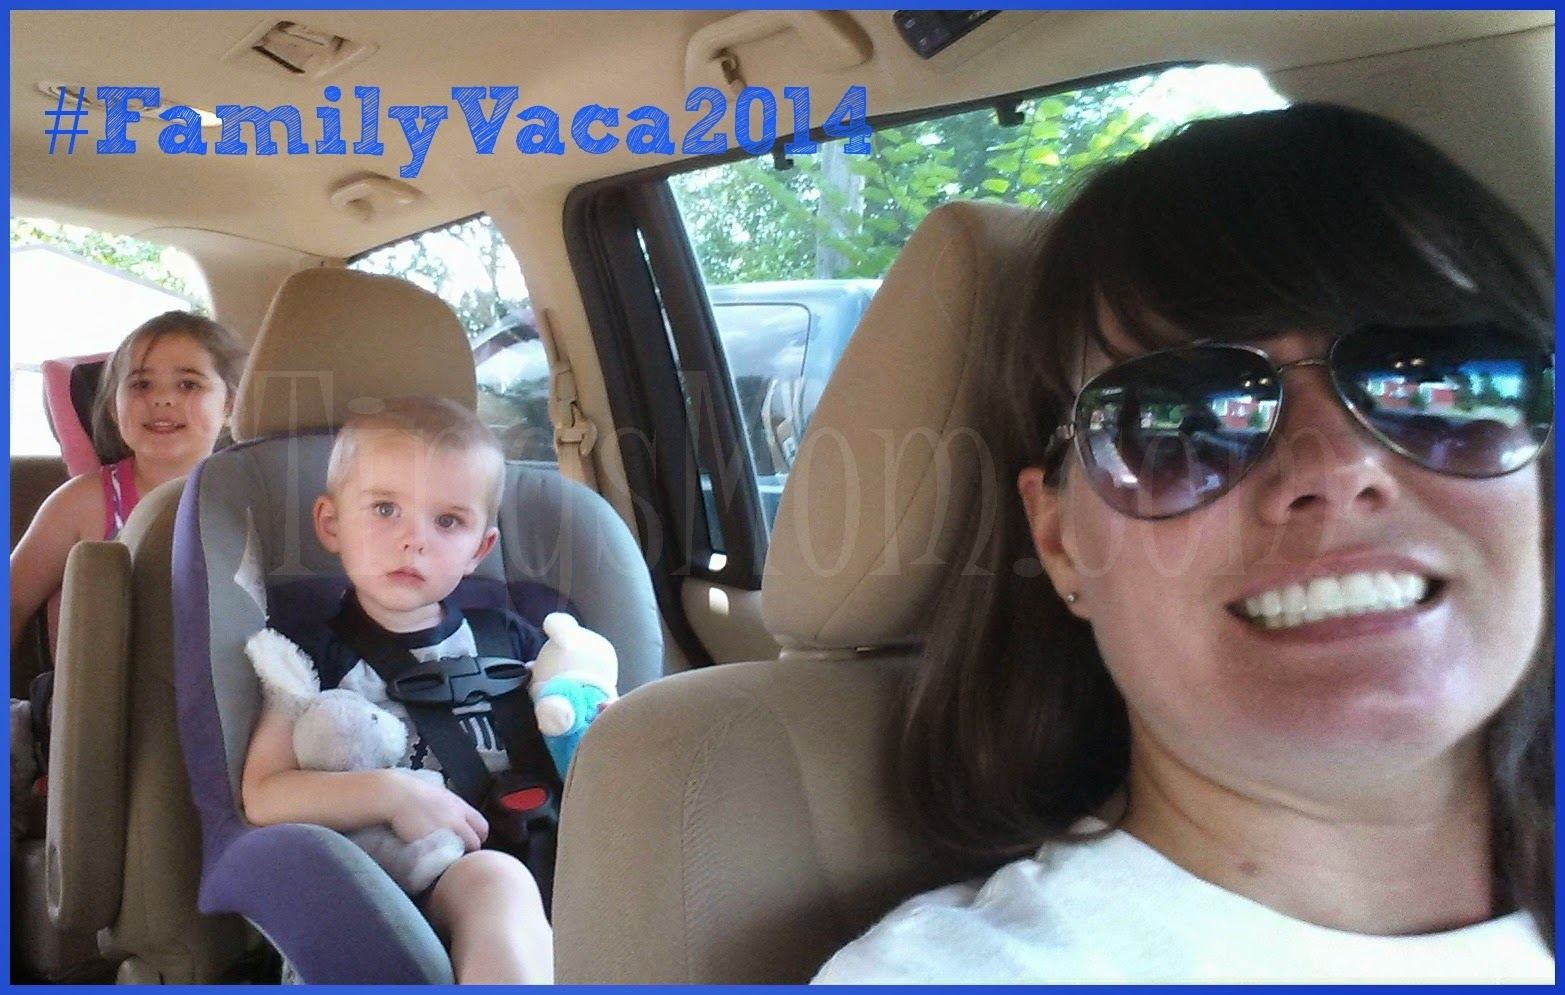 Family Vacation 2014 | #familyvaca2014 #cedarcreeklake #familyfun